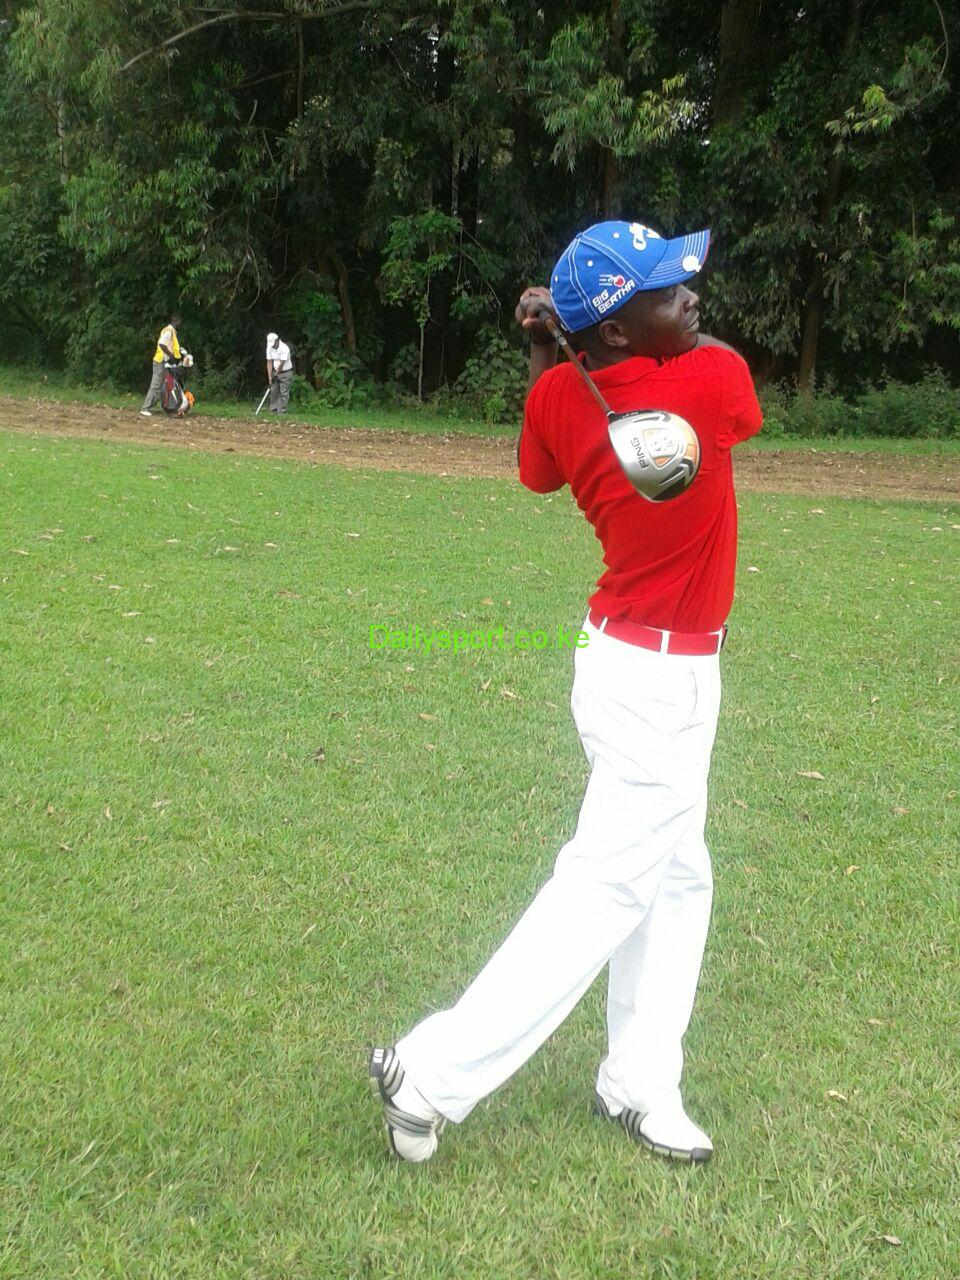 Joseph Nzomo, Hillary Rotich, Jonathan Cheruiyot, Harun Ndegwa, Philip Shiharsy, Anthony Lubao, Hannah Rutenbar, CIC Insurance, CIC Insurance golf tournament,